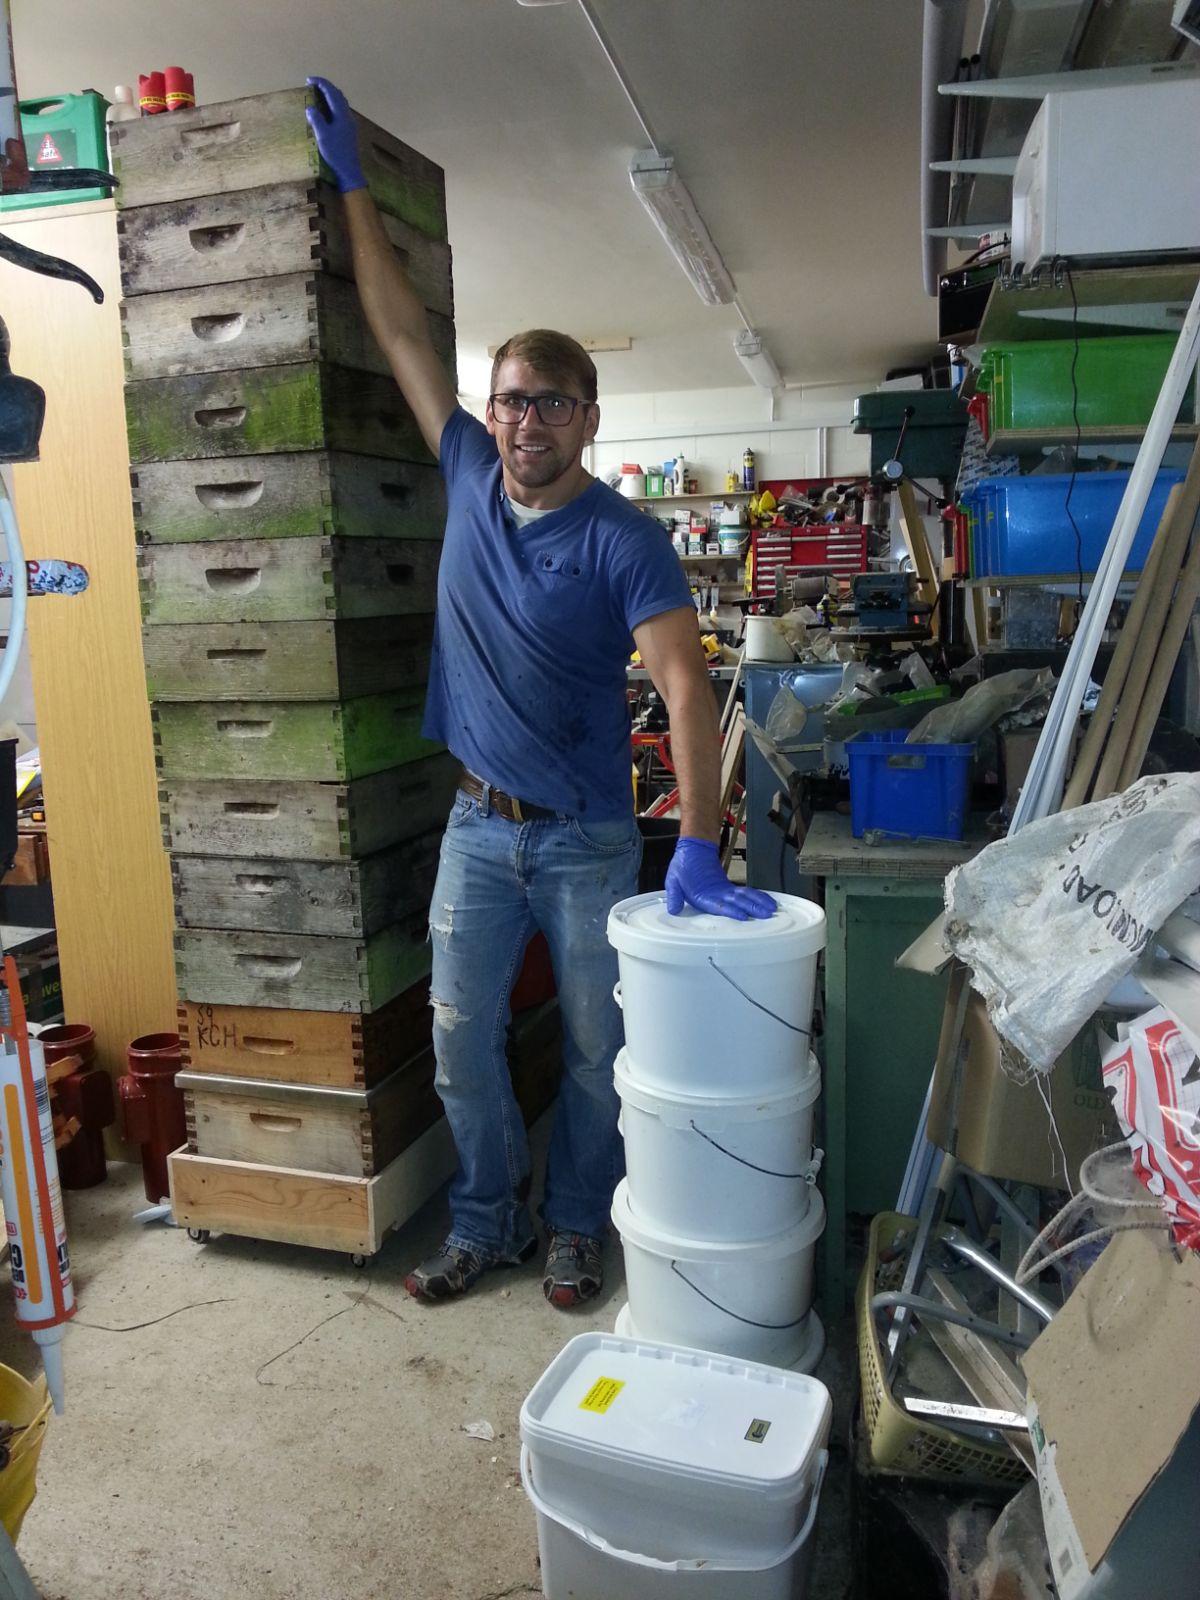 Steve the beekeeper